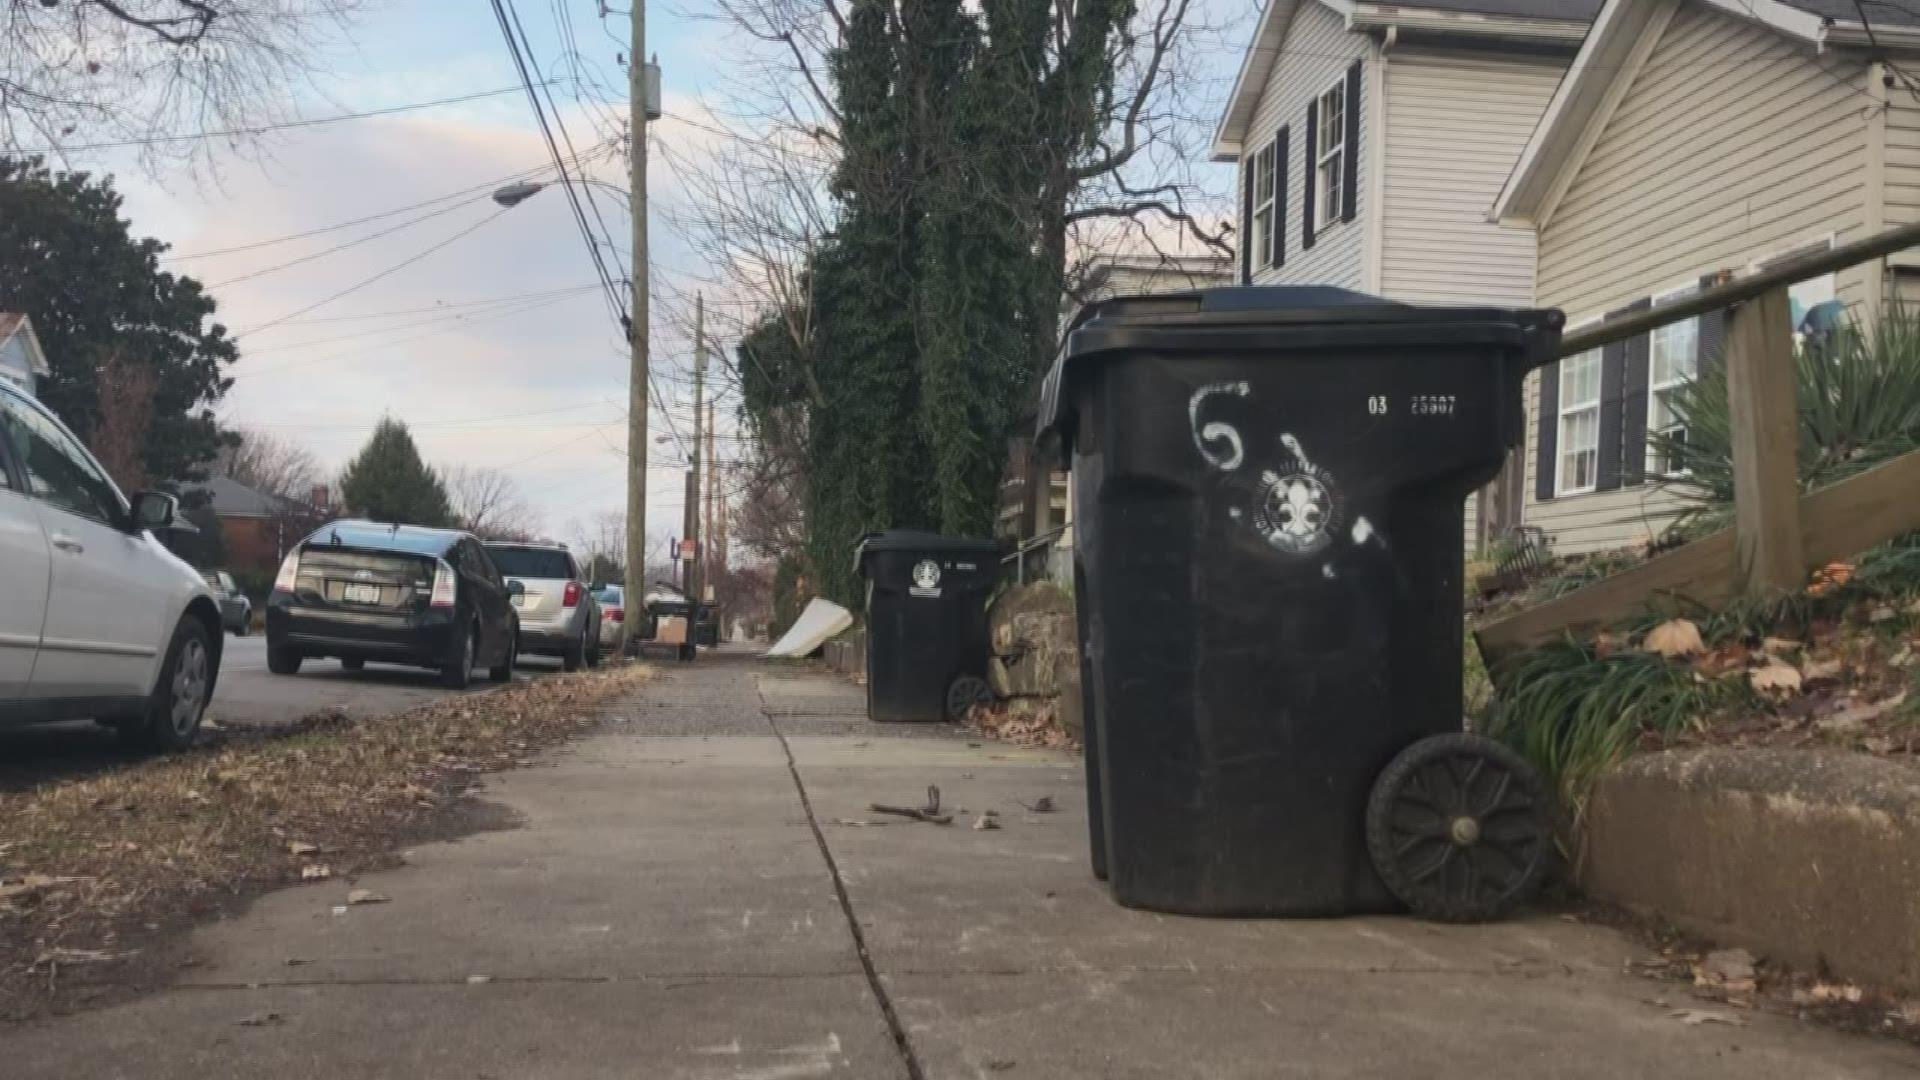 Holiday Trash Pick Up Returns To Louisville Firstcoastnews Com